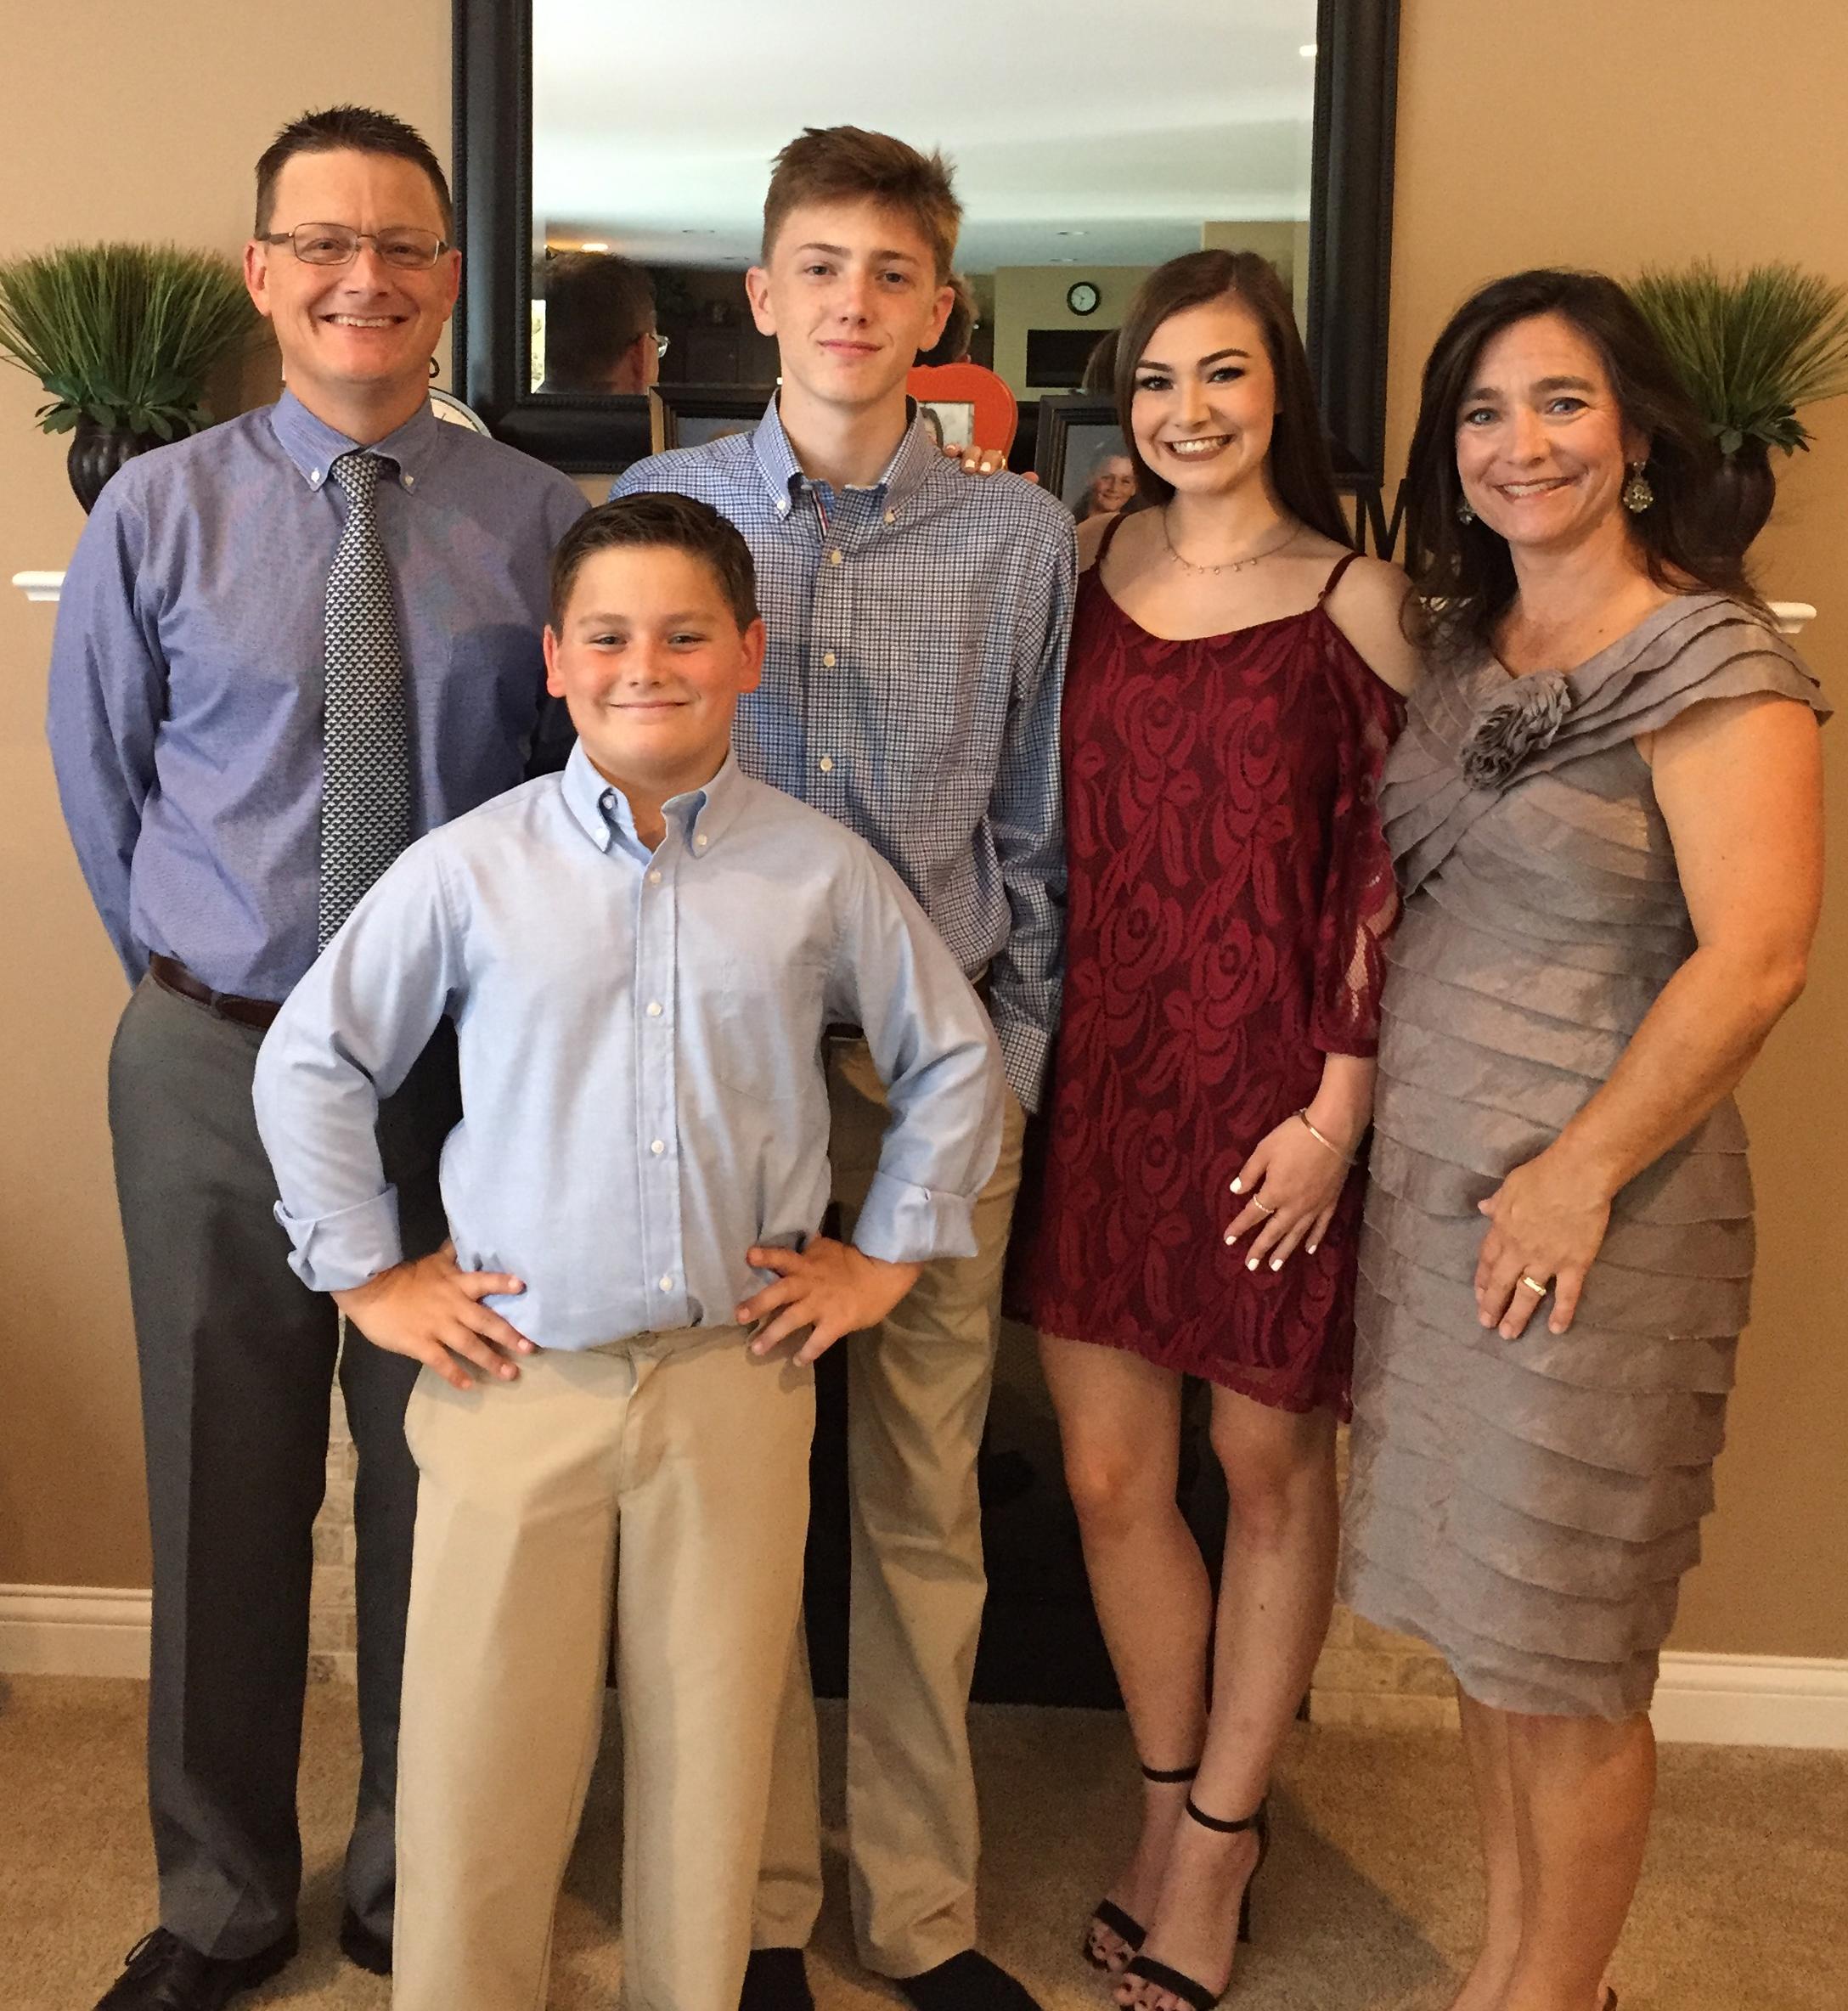 Kidney donor Shari Weber, her husband and recipient Jeff with their three children.